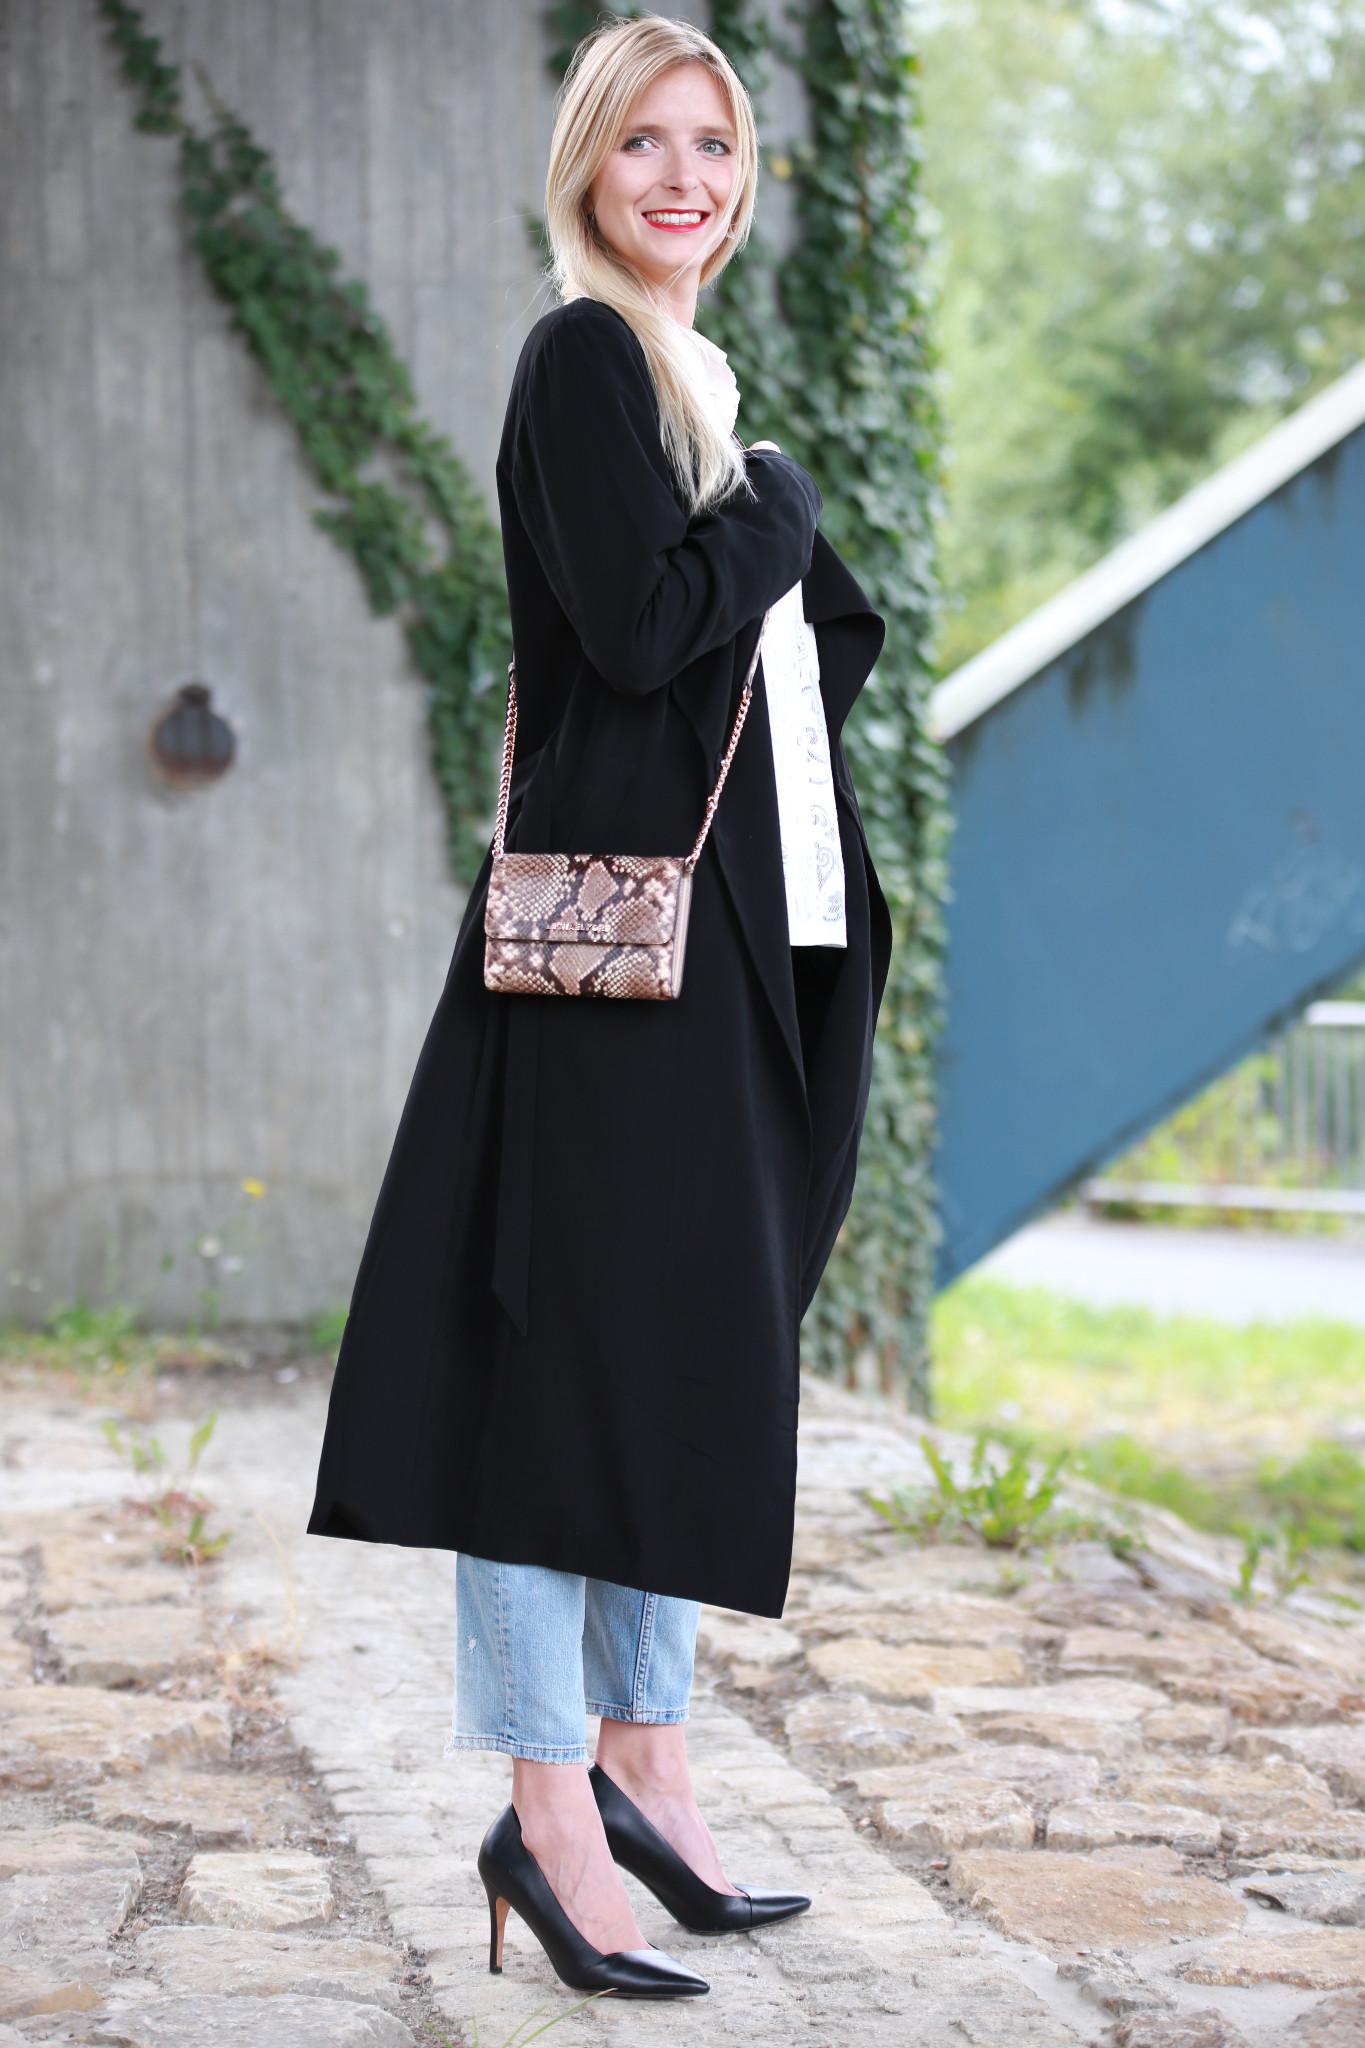 Fashion_Outfit_Michael_Kors_Jet_Set_38